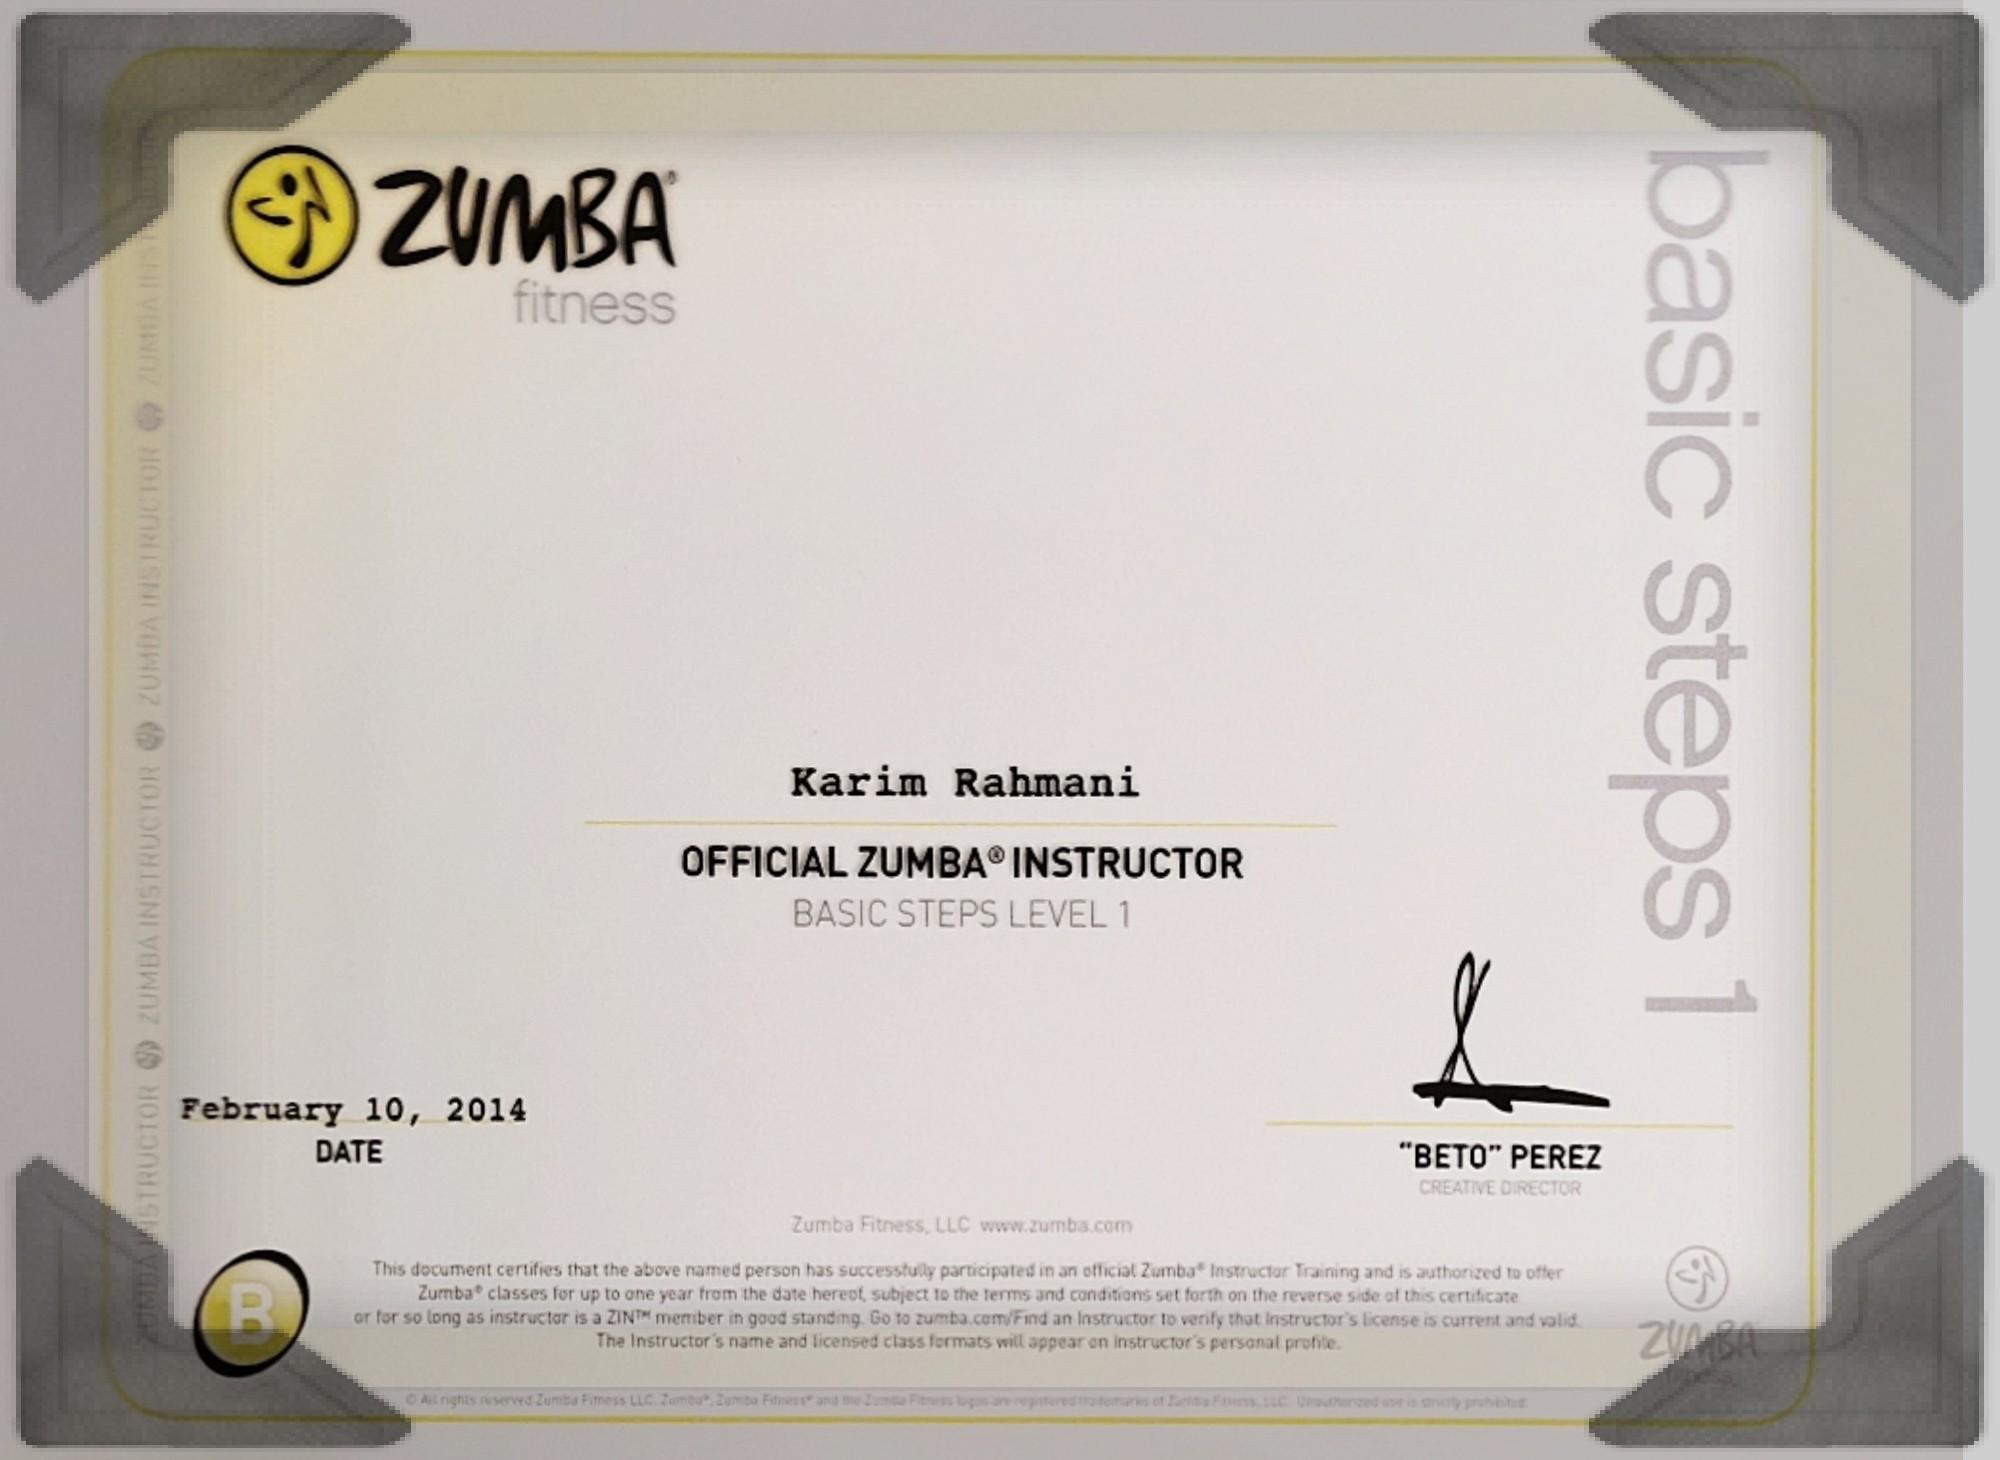 Karims Tanzschule Urkunde Zumba Fitness